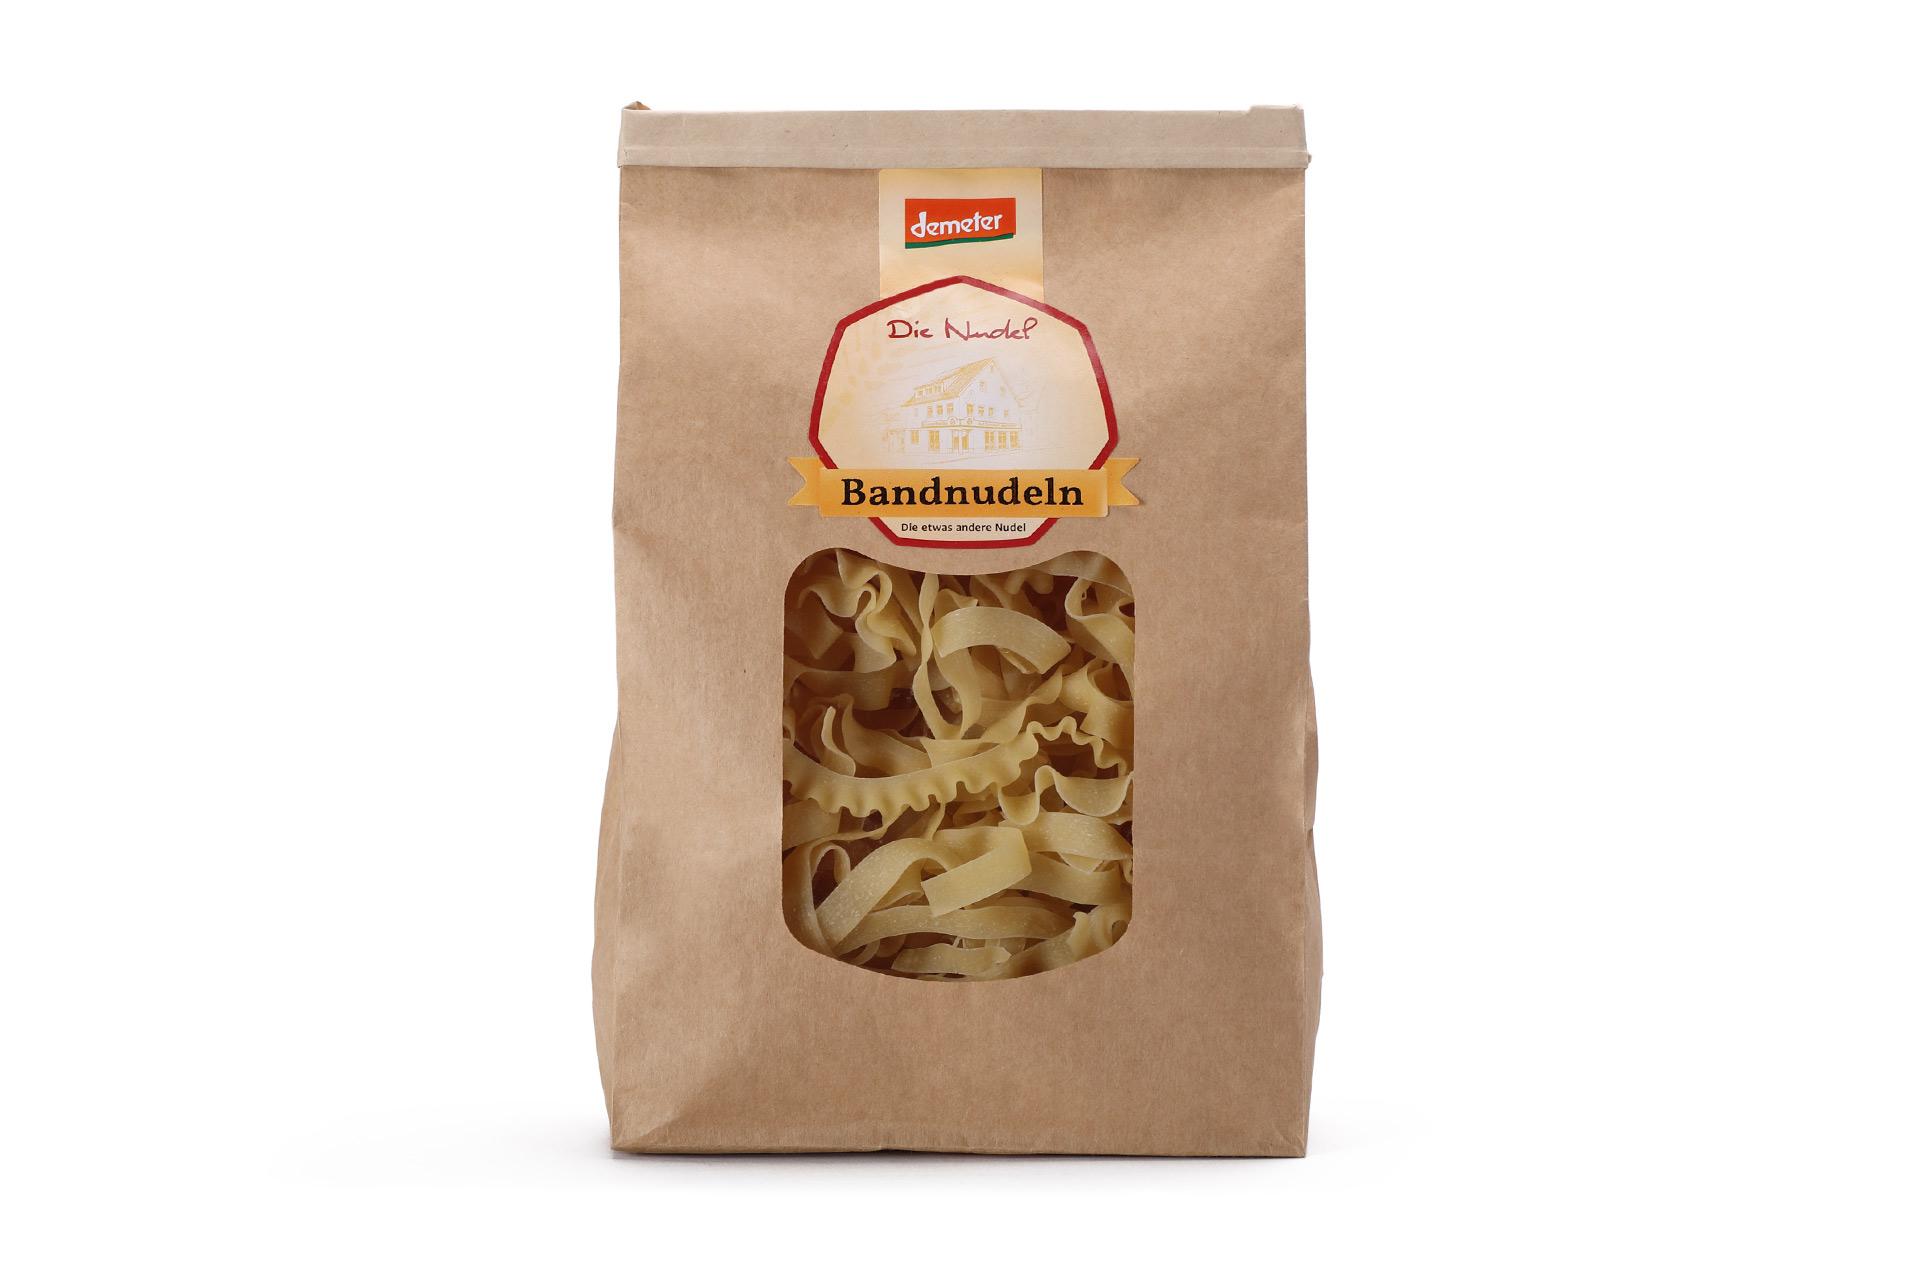 Bandnudel-Hartweizengriess-Bio_Verpackung-ksg